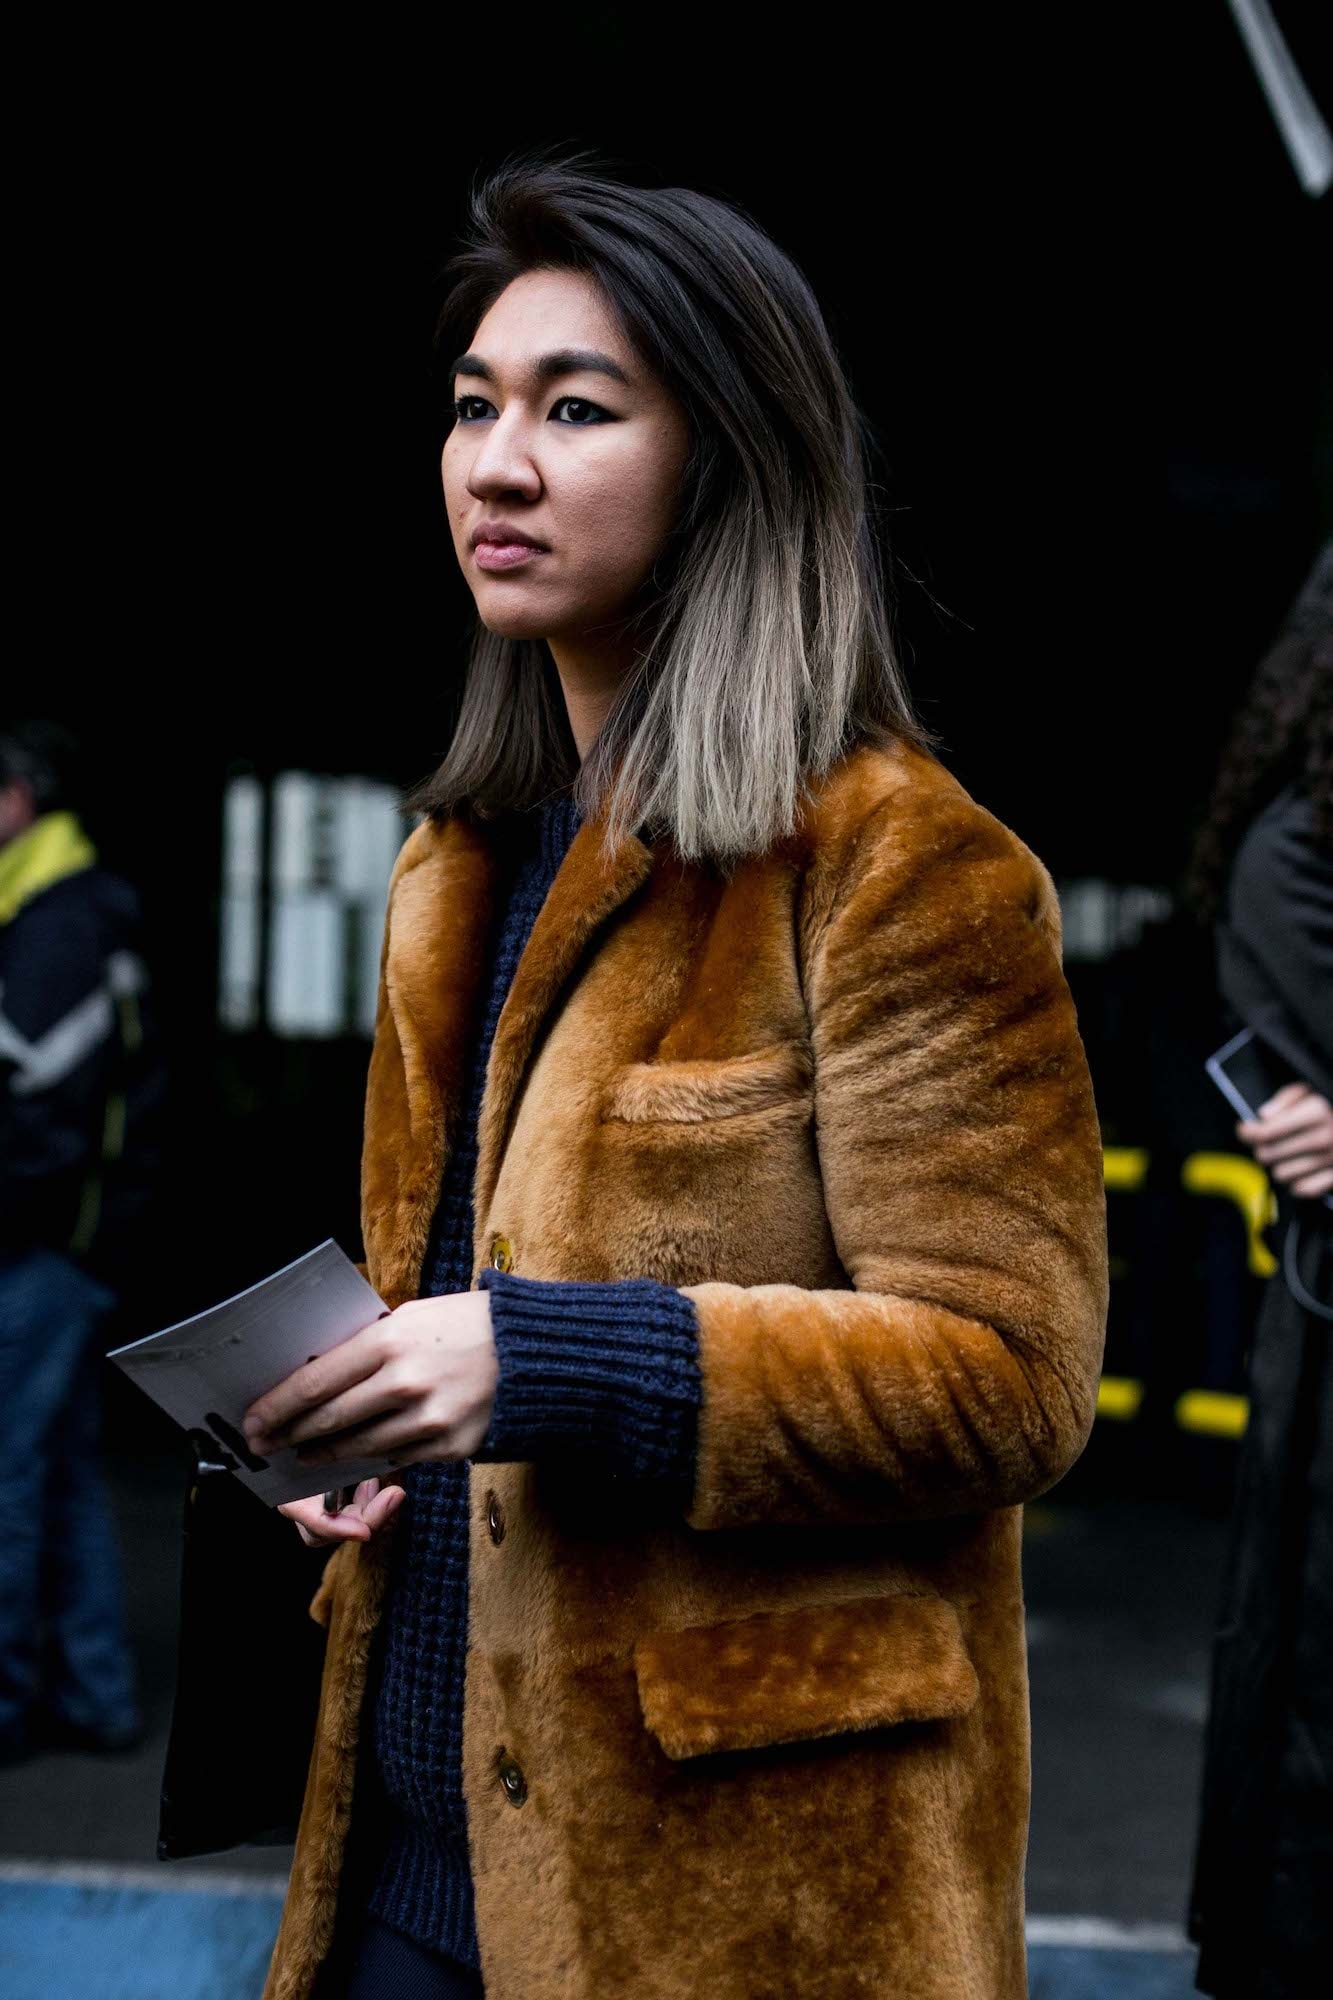 14 Warna Rambut Ombre Abu Abu Yang Cocok Untuk Wanita Indonesia